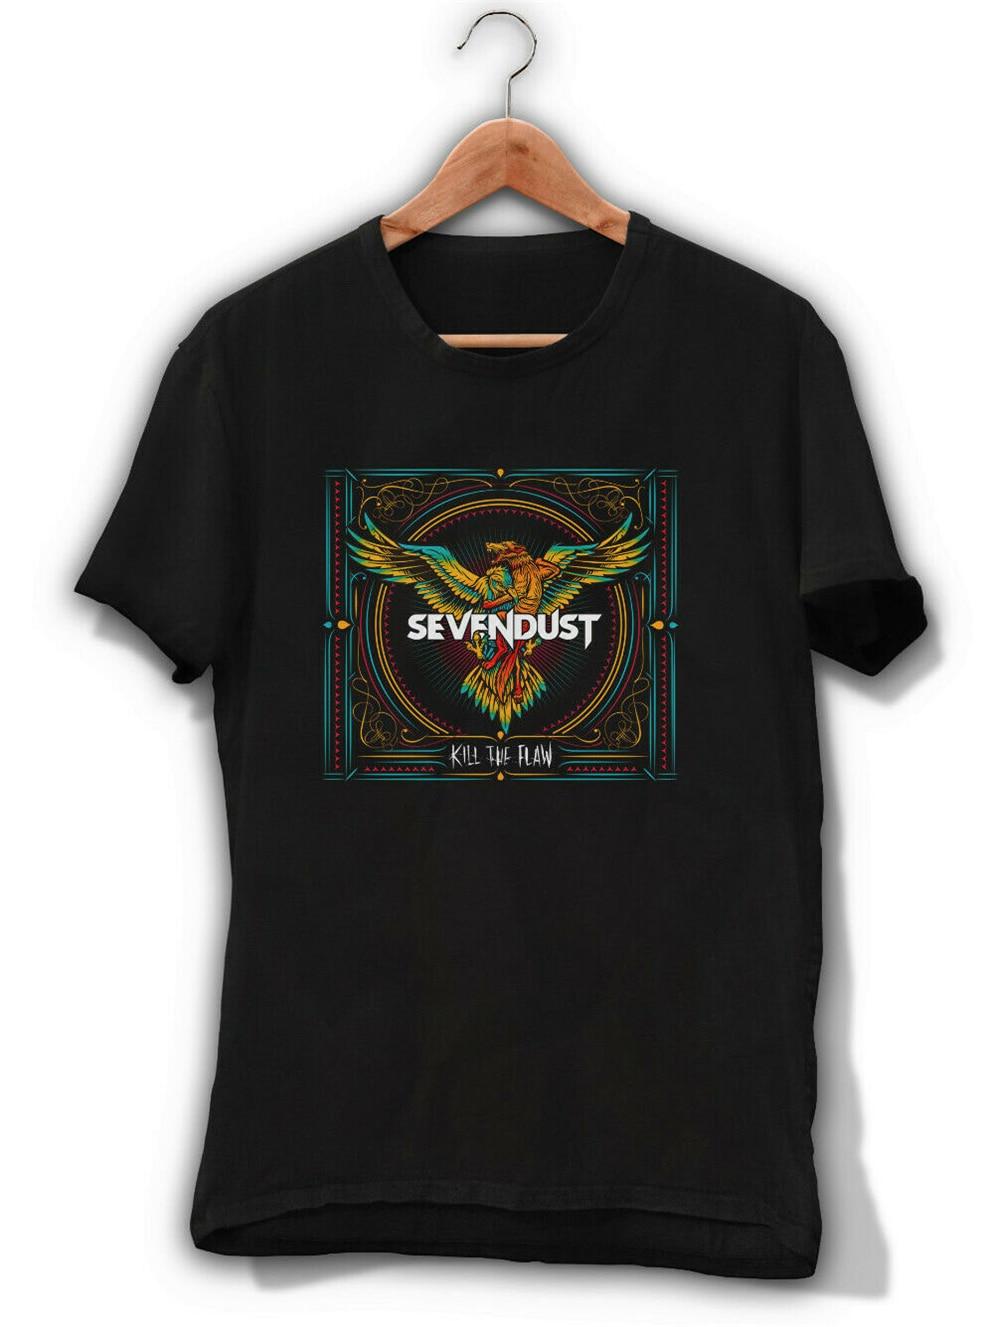 Sevendust Kill The Flaw Black T-Shirt Heavy Metal Band Tee Shirt Clutch Tremonti Classic Unique Tee Shirt